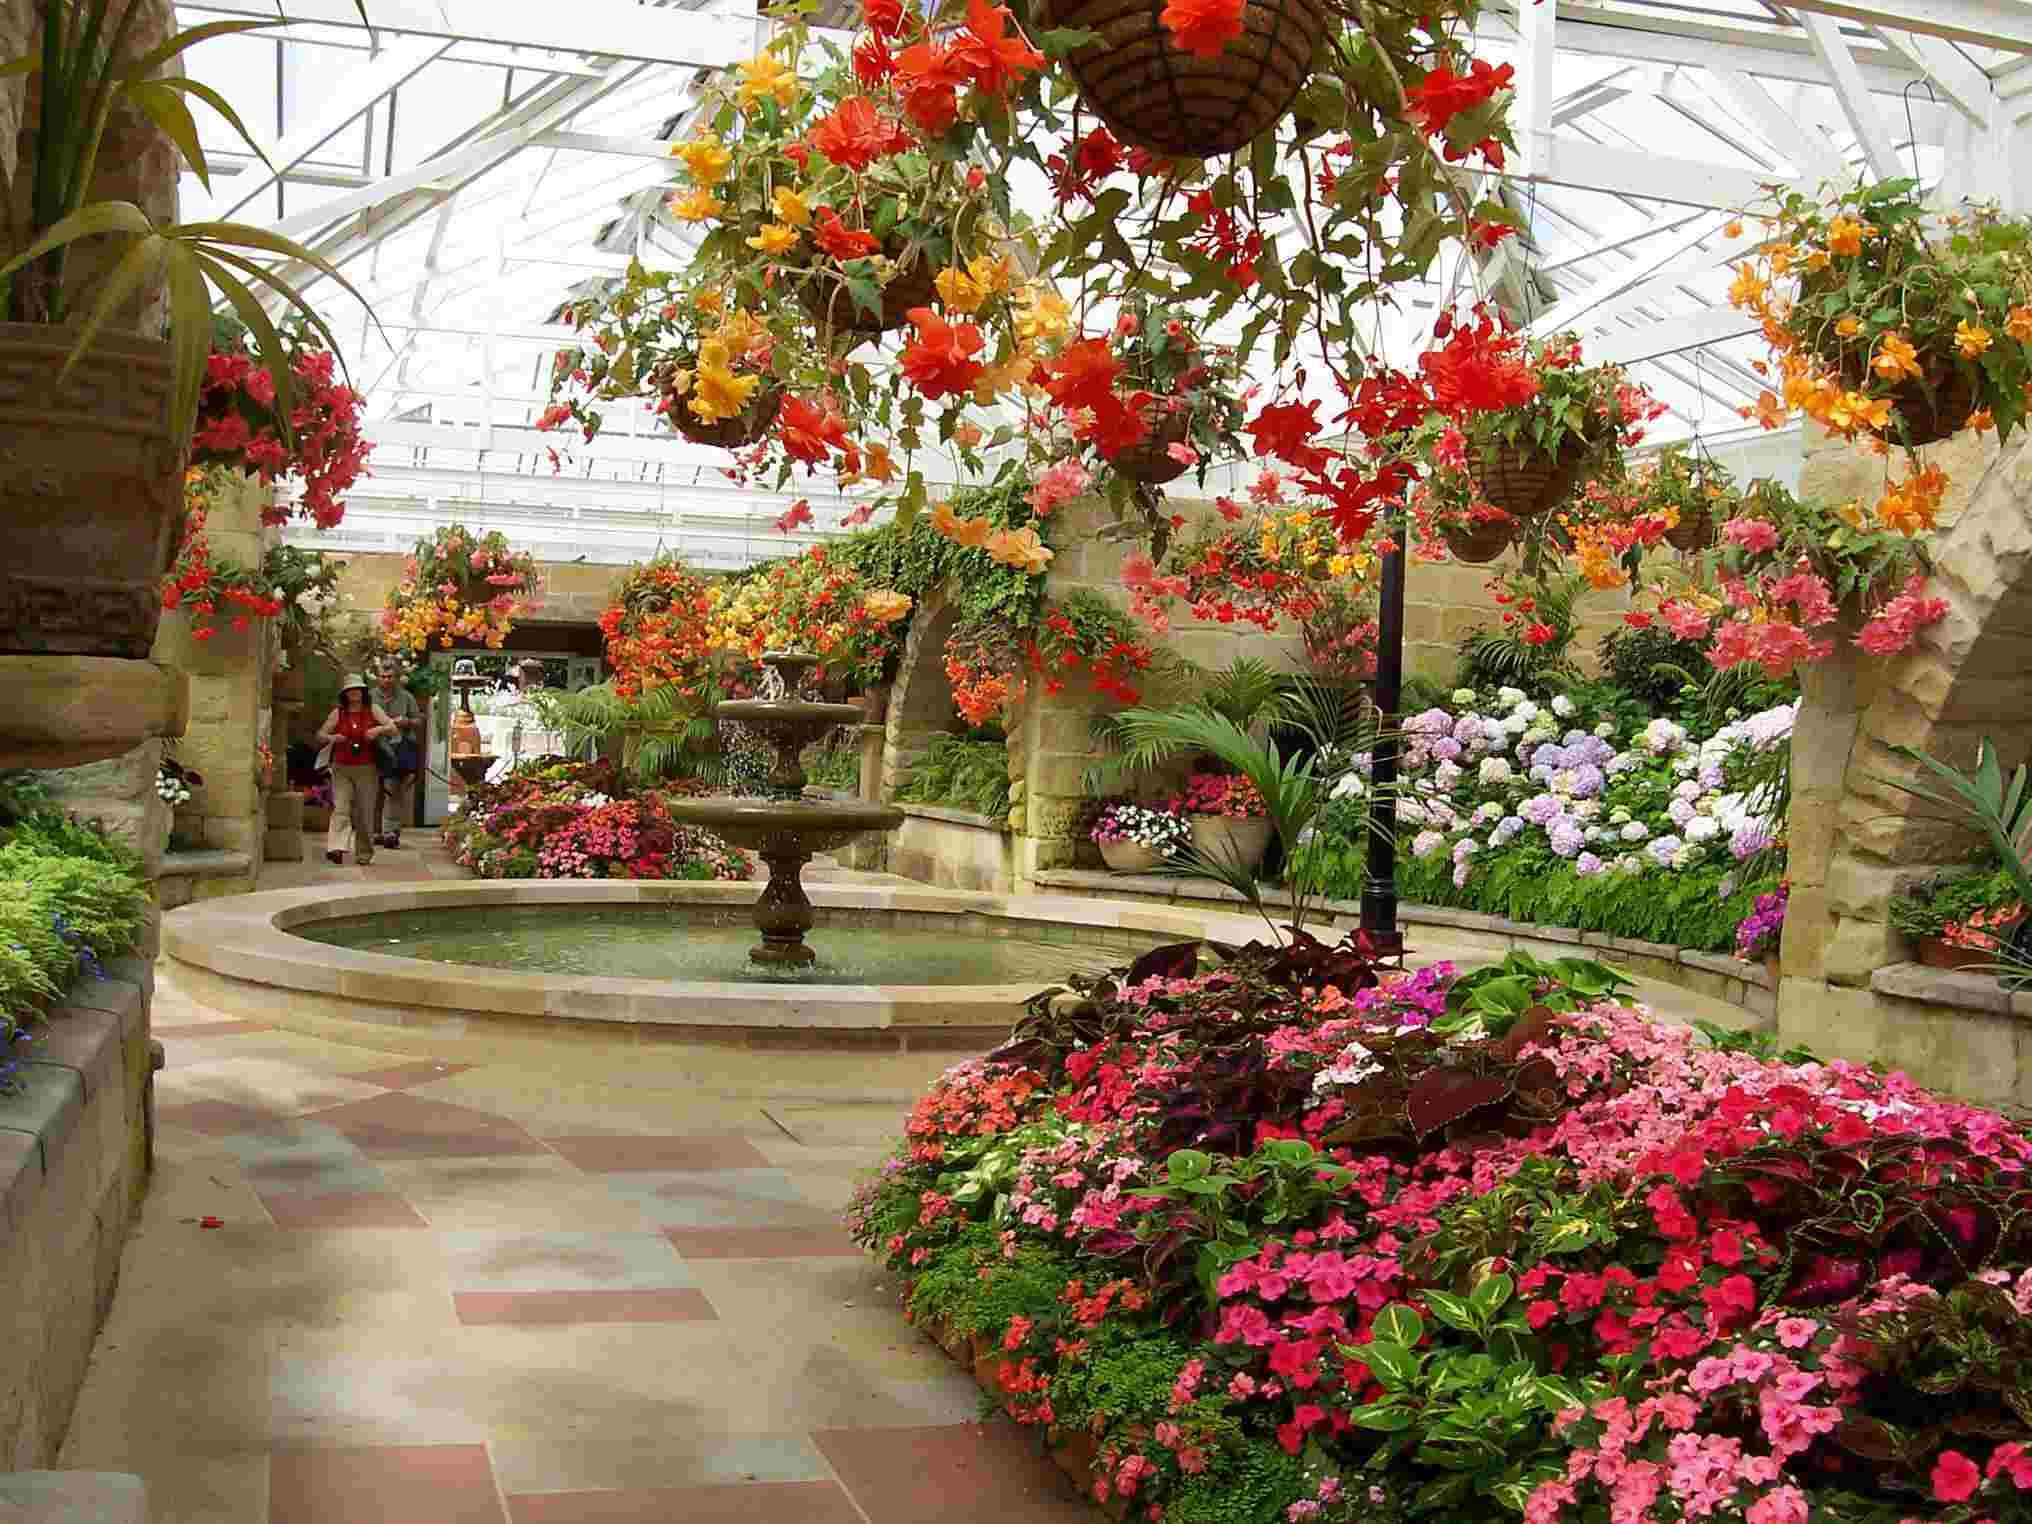 Jardines y espacios verdes jardines jardines fondos - Paisajes y jardines ...